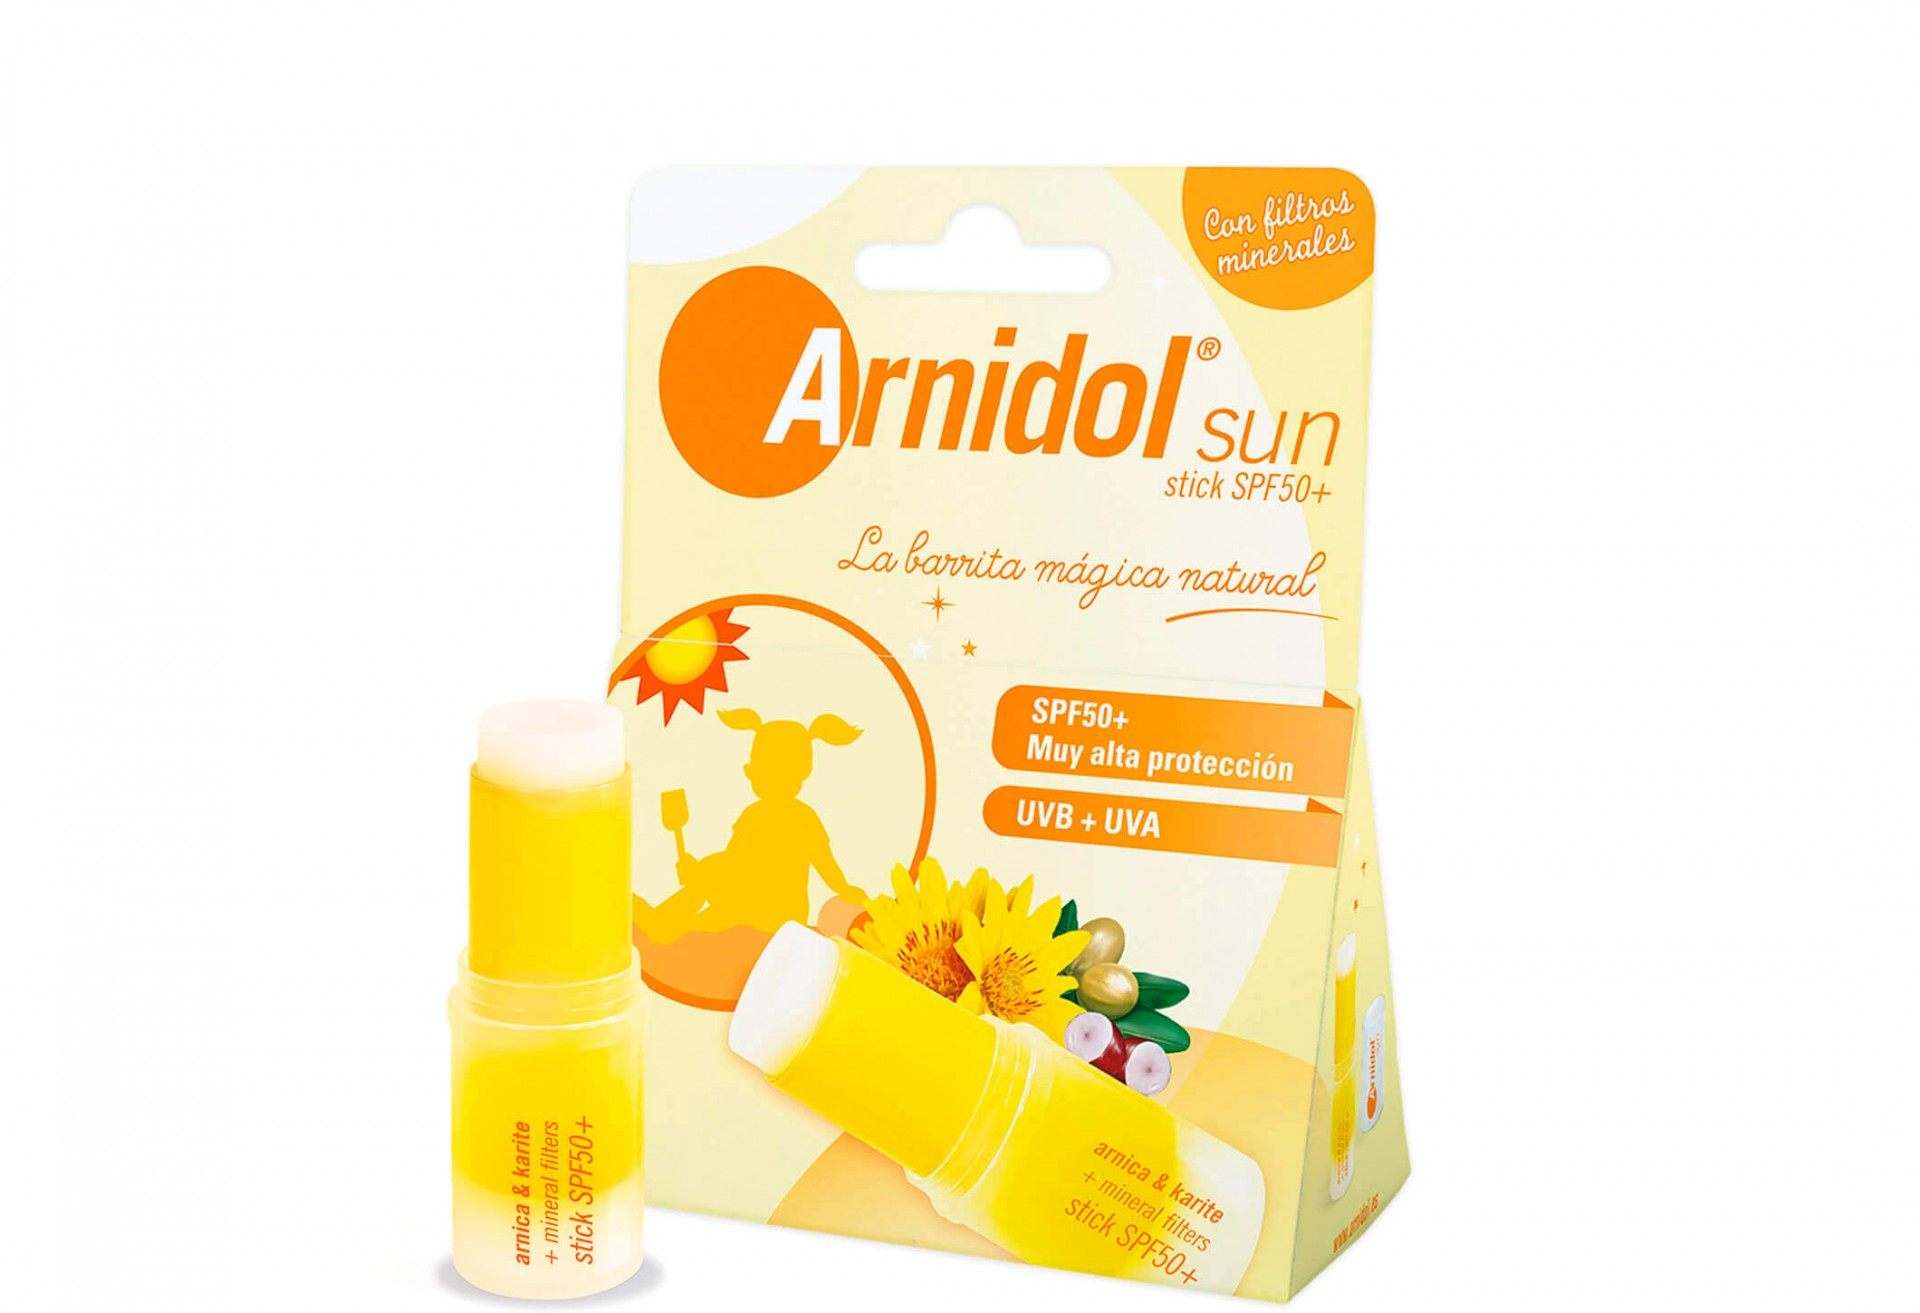 Arnidol | Sun Stick SPF50+